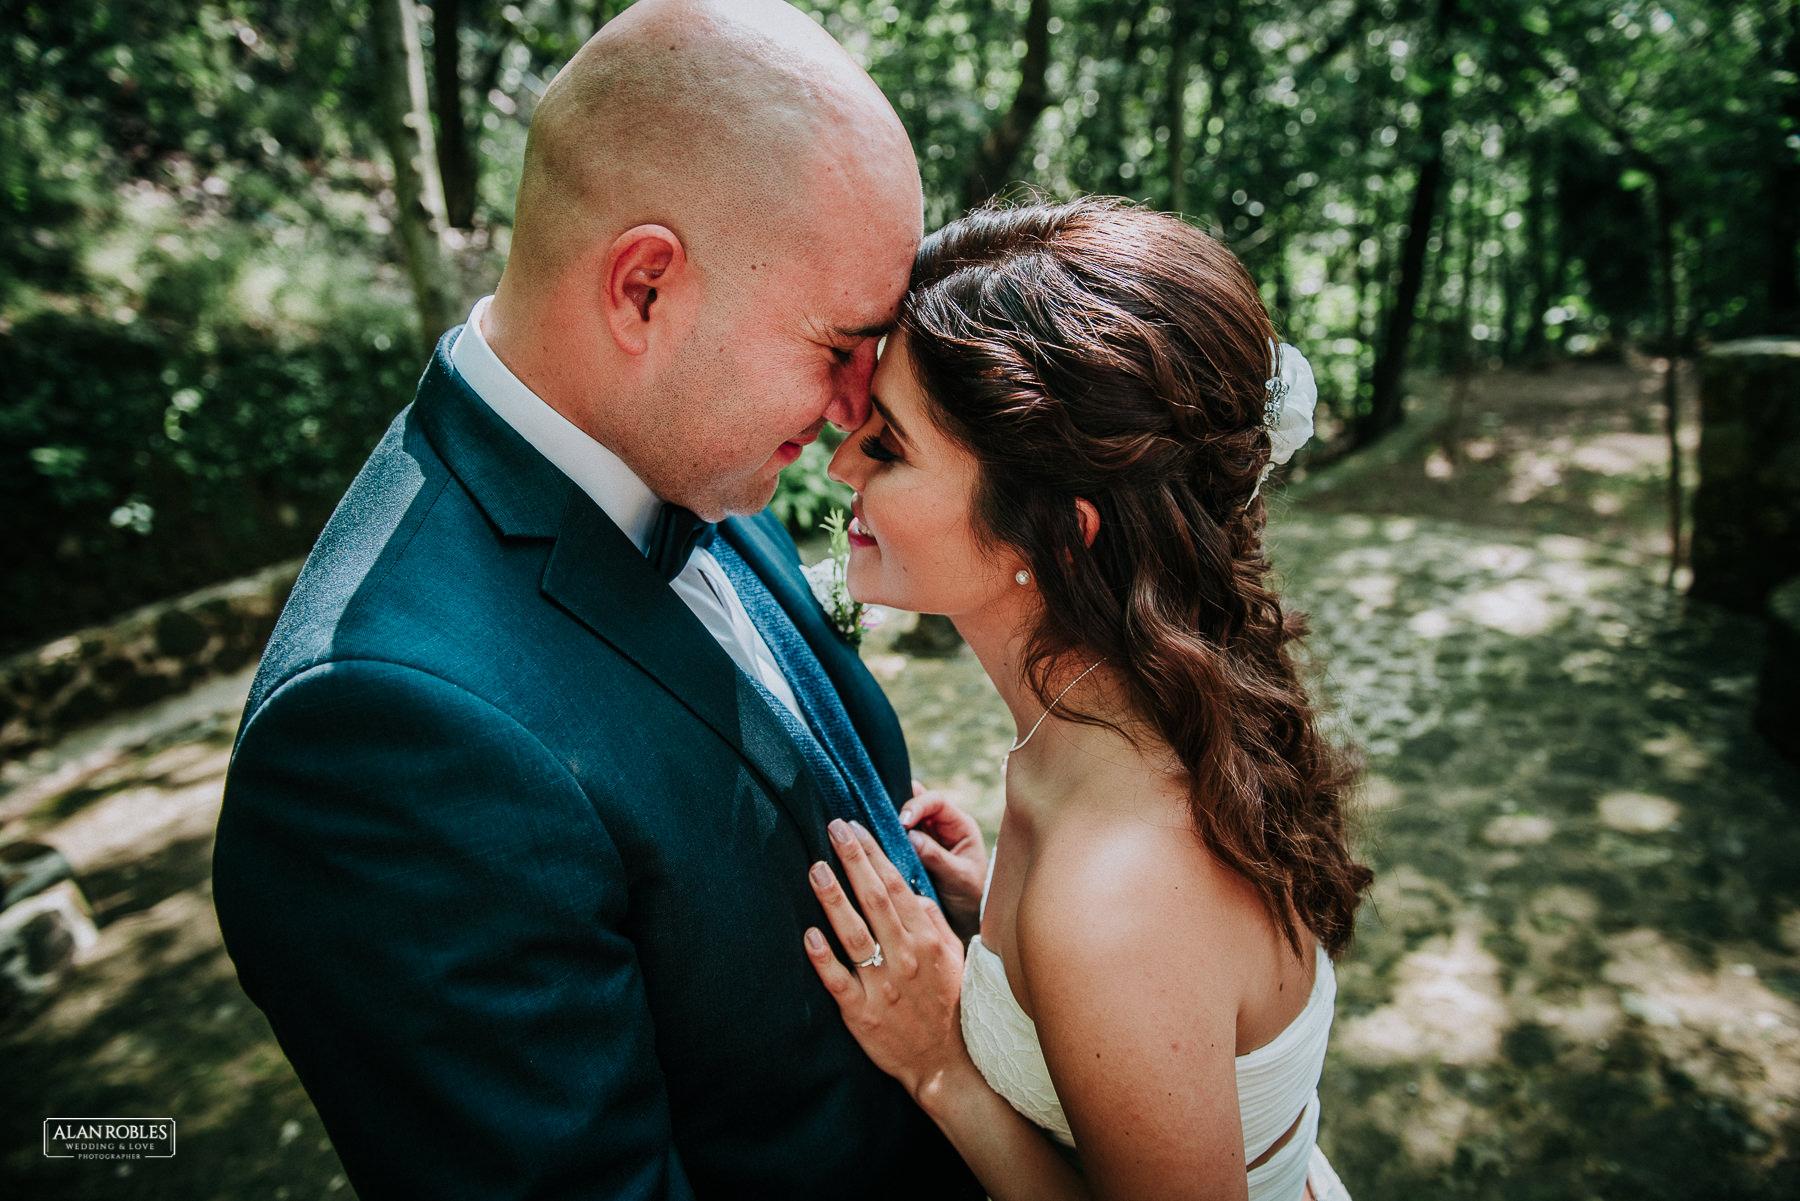 Fotografo de bodas guadalajara Alan Robles - Pinare terraza bistro 20